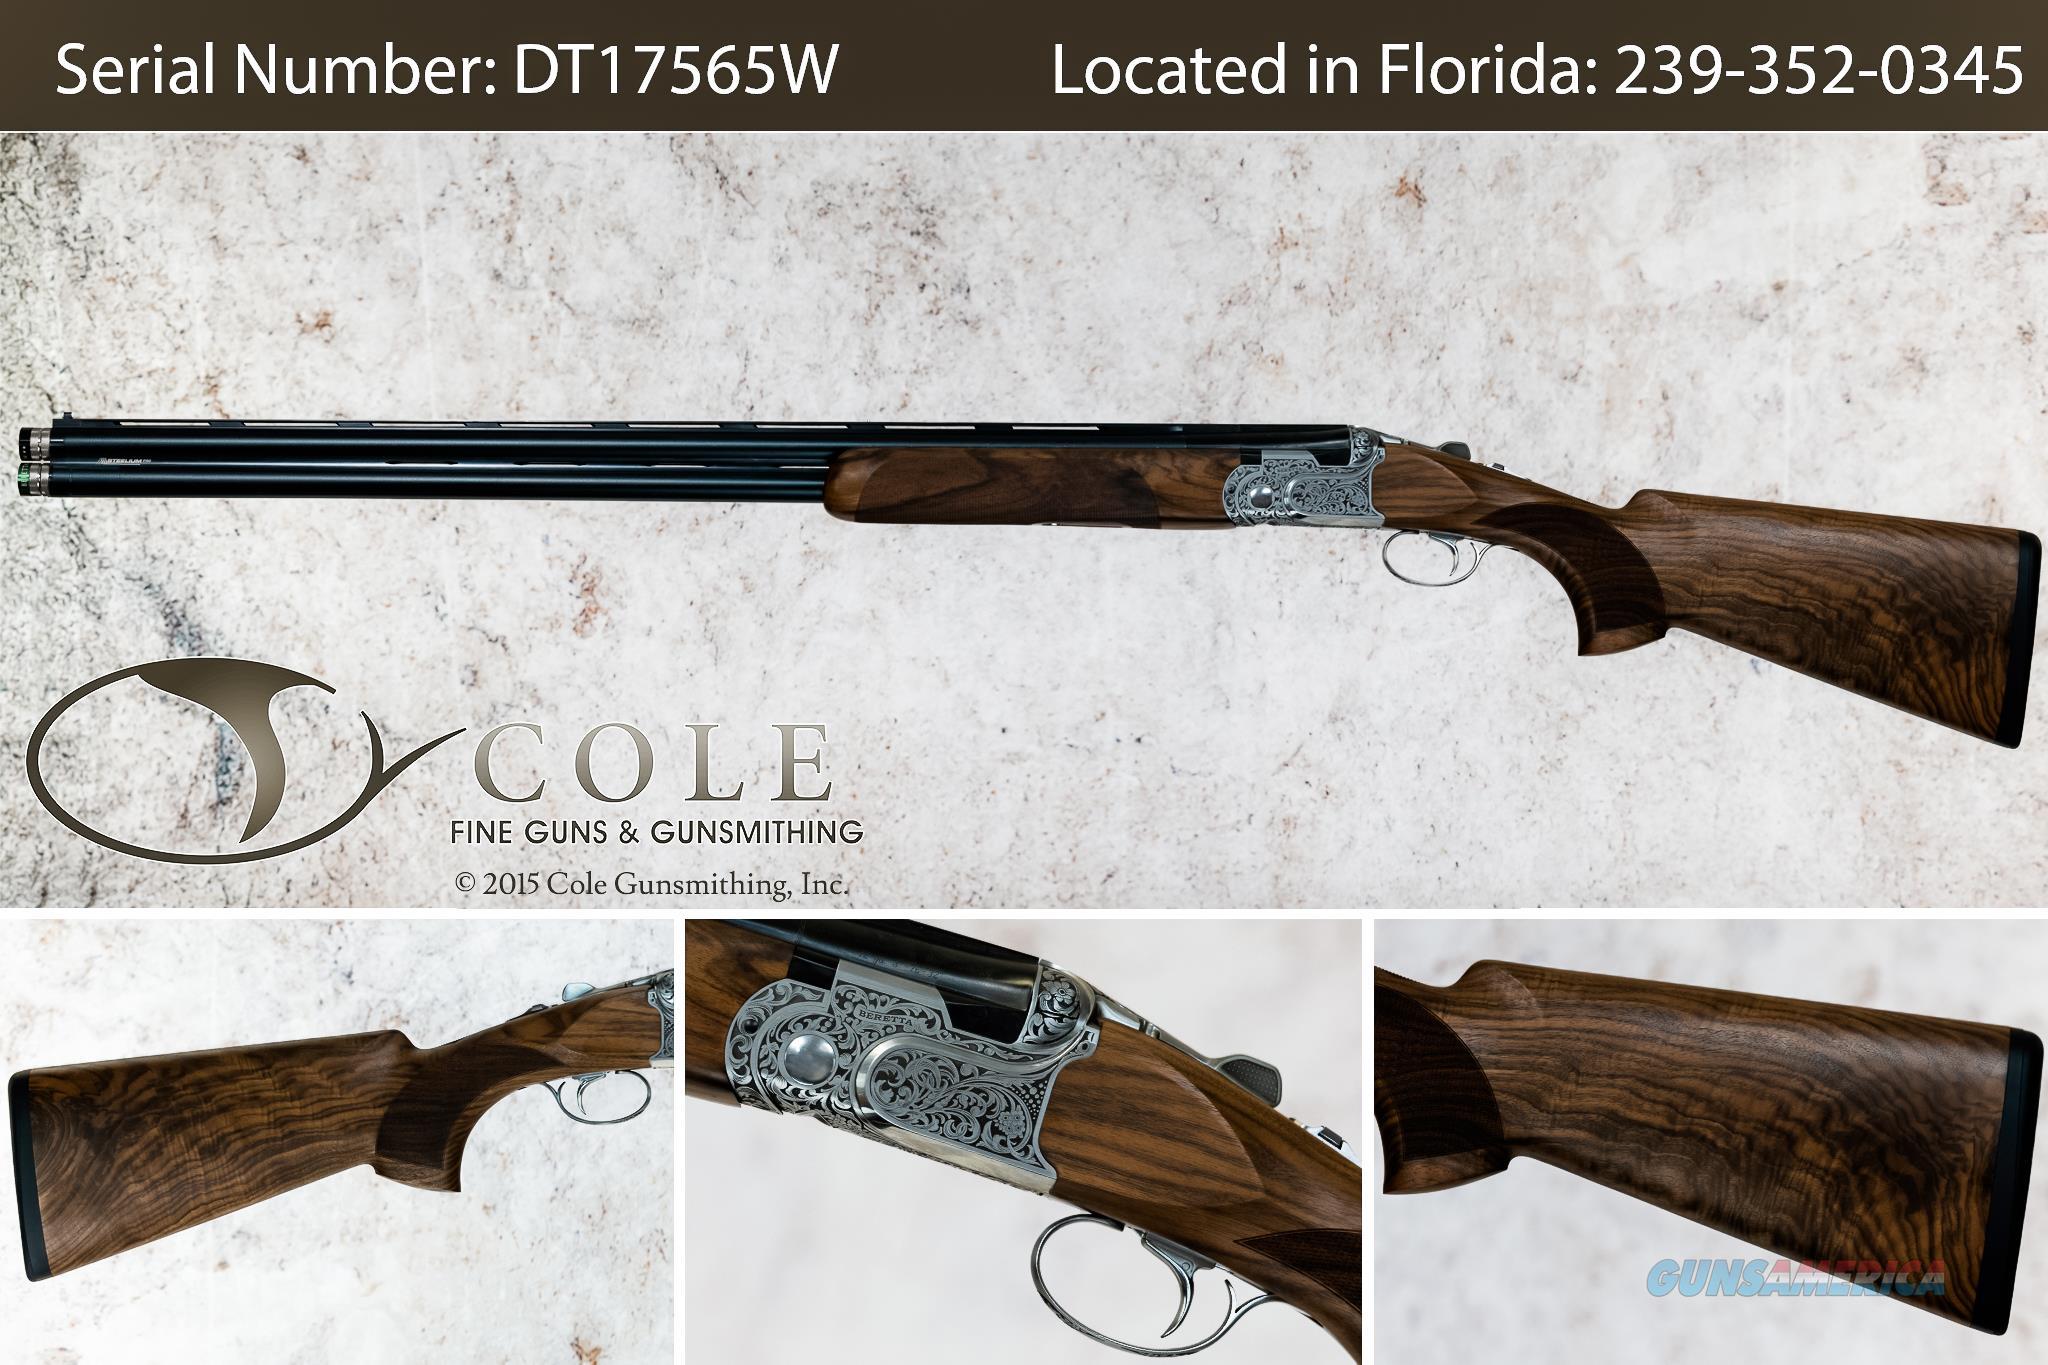 "Beretta DT11 LUSSO Sporting 12g 32"" SN# DT17565W  Guns > Shotguns > Beretta Shotguns > O/U > Trap/Skeet"